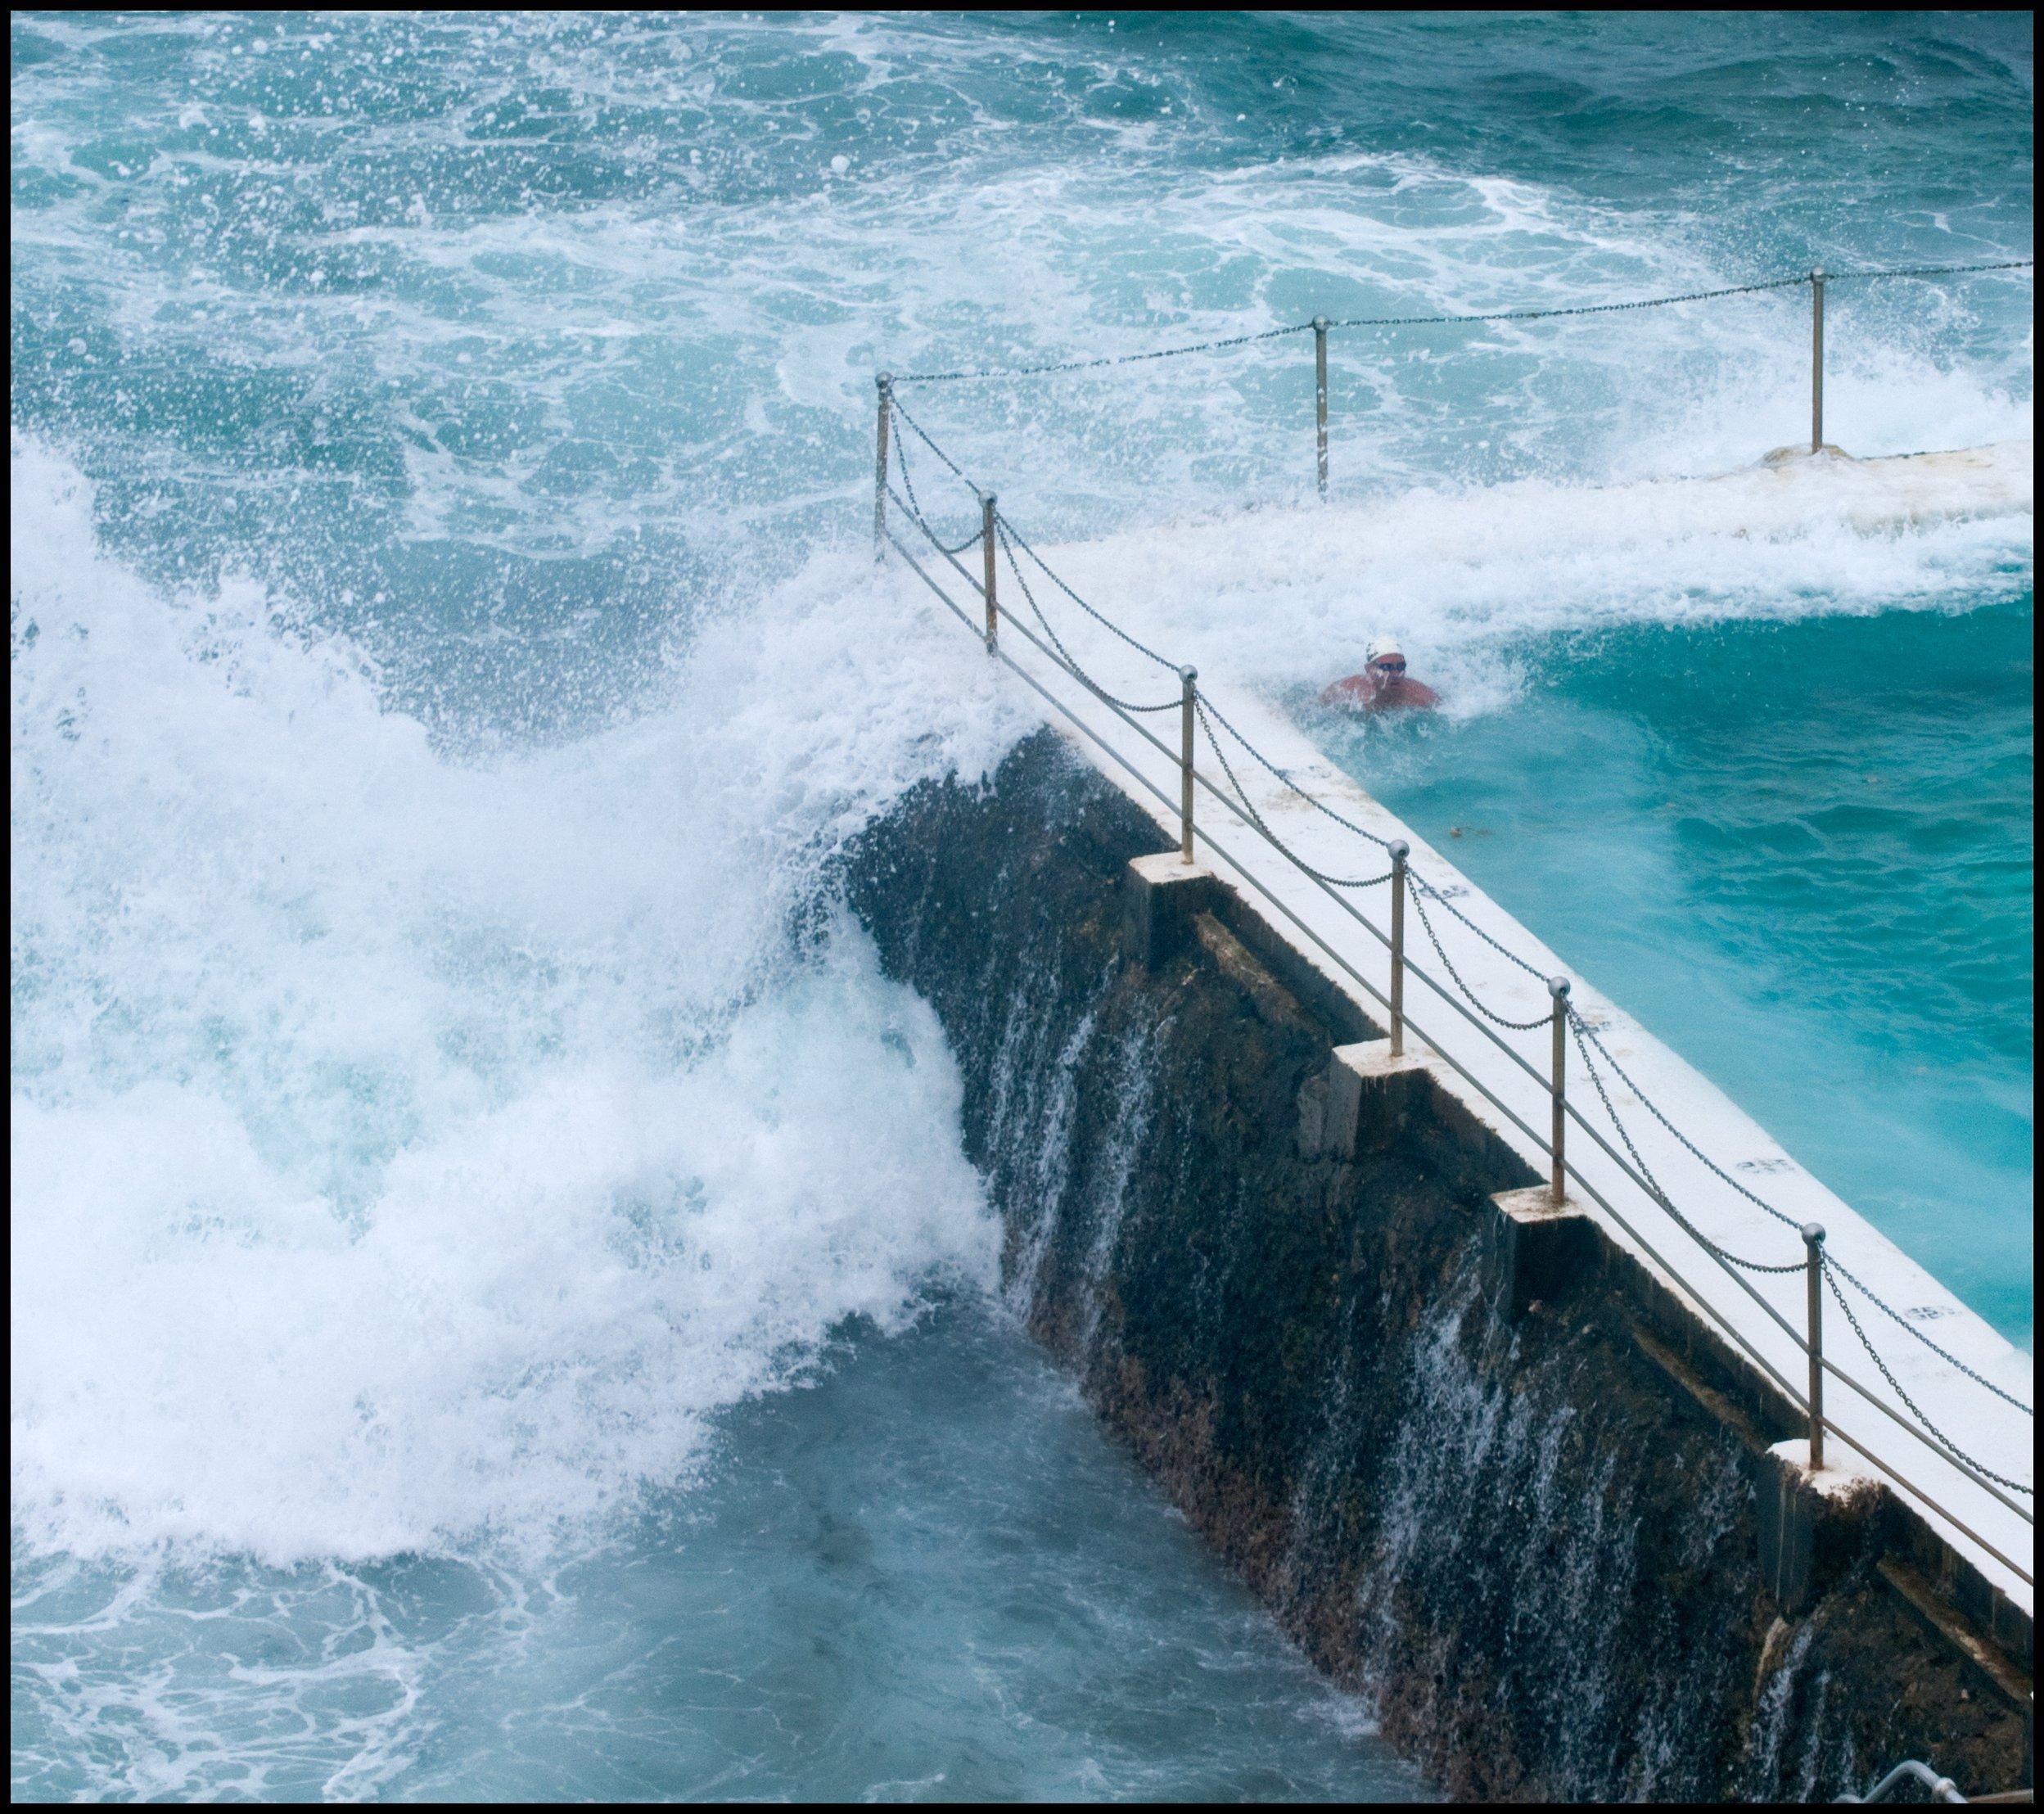 The Pool (Bondi Beach, Sydney)